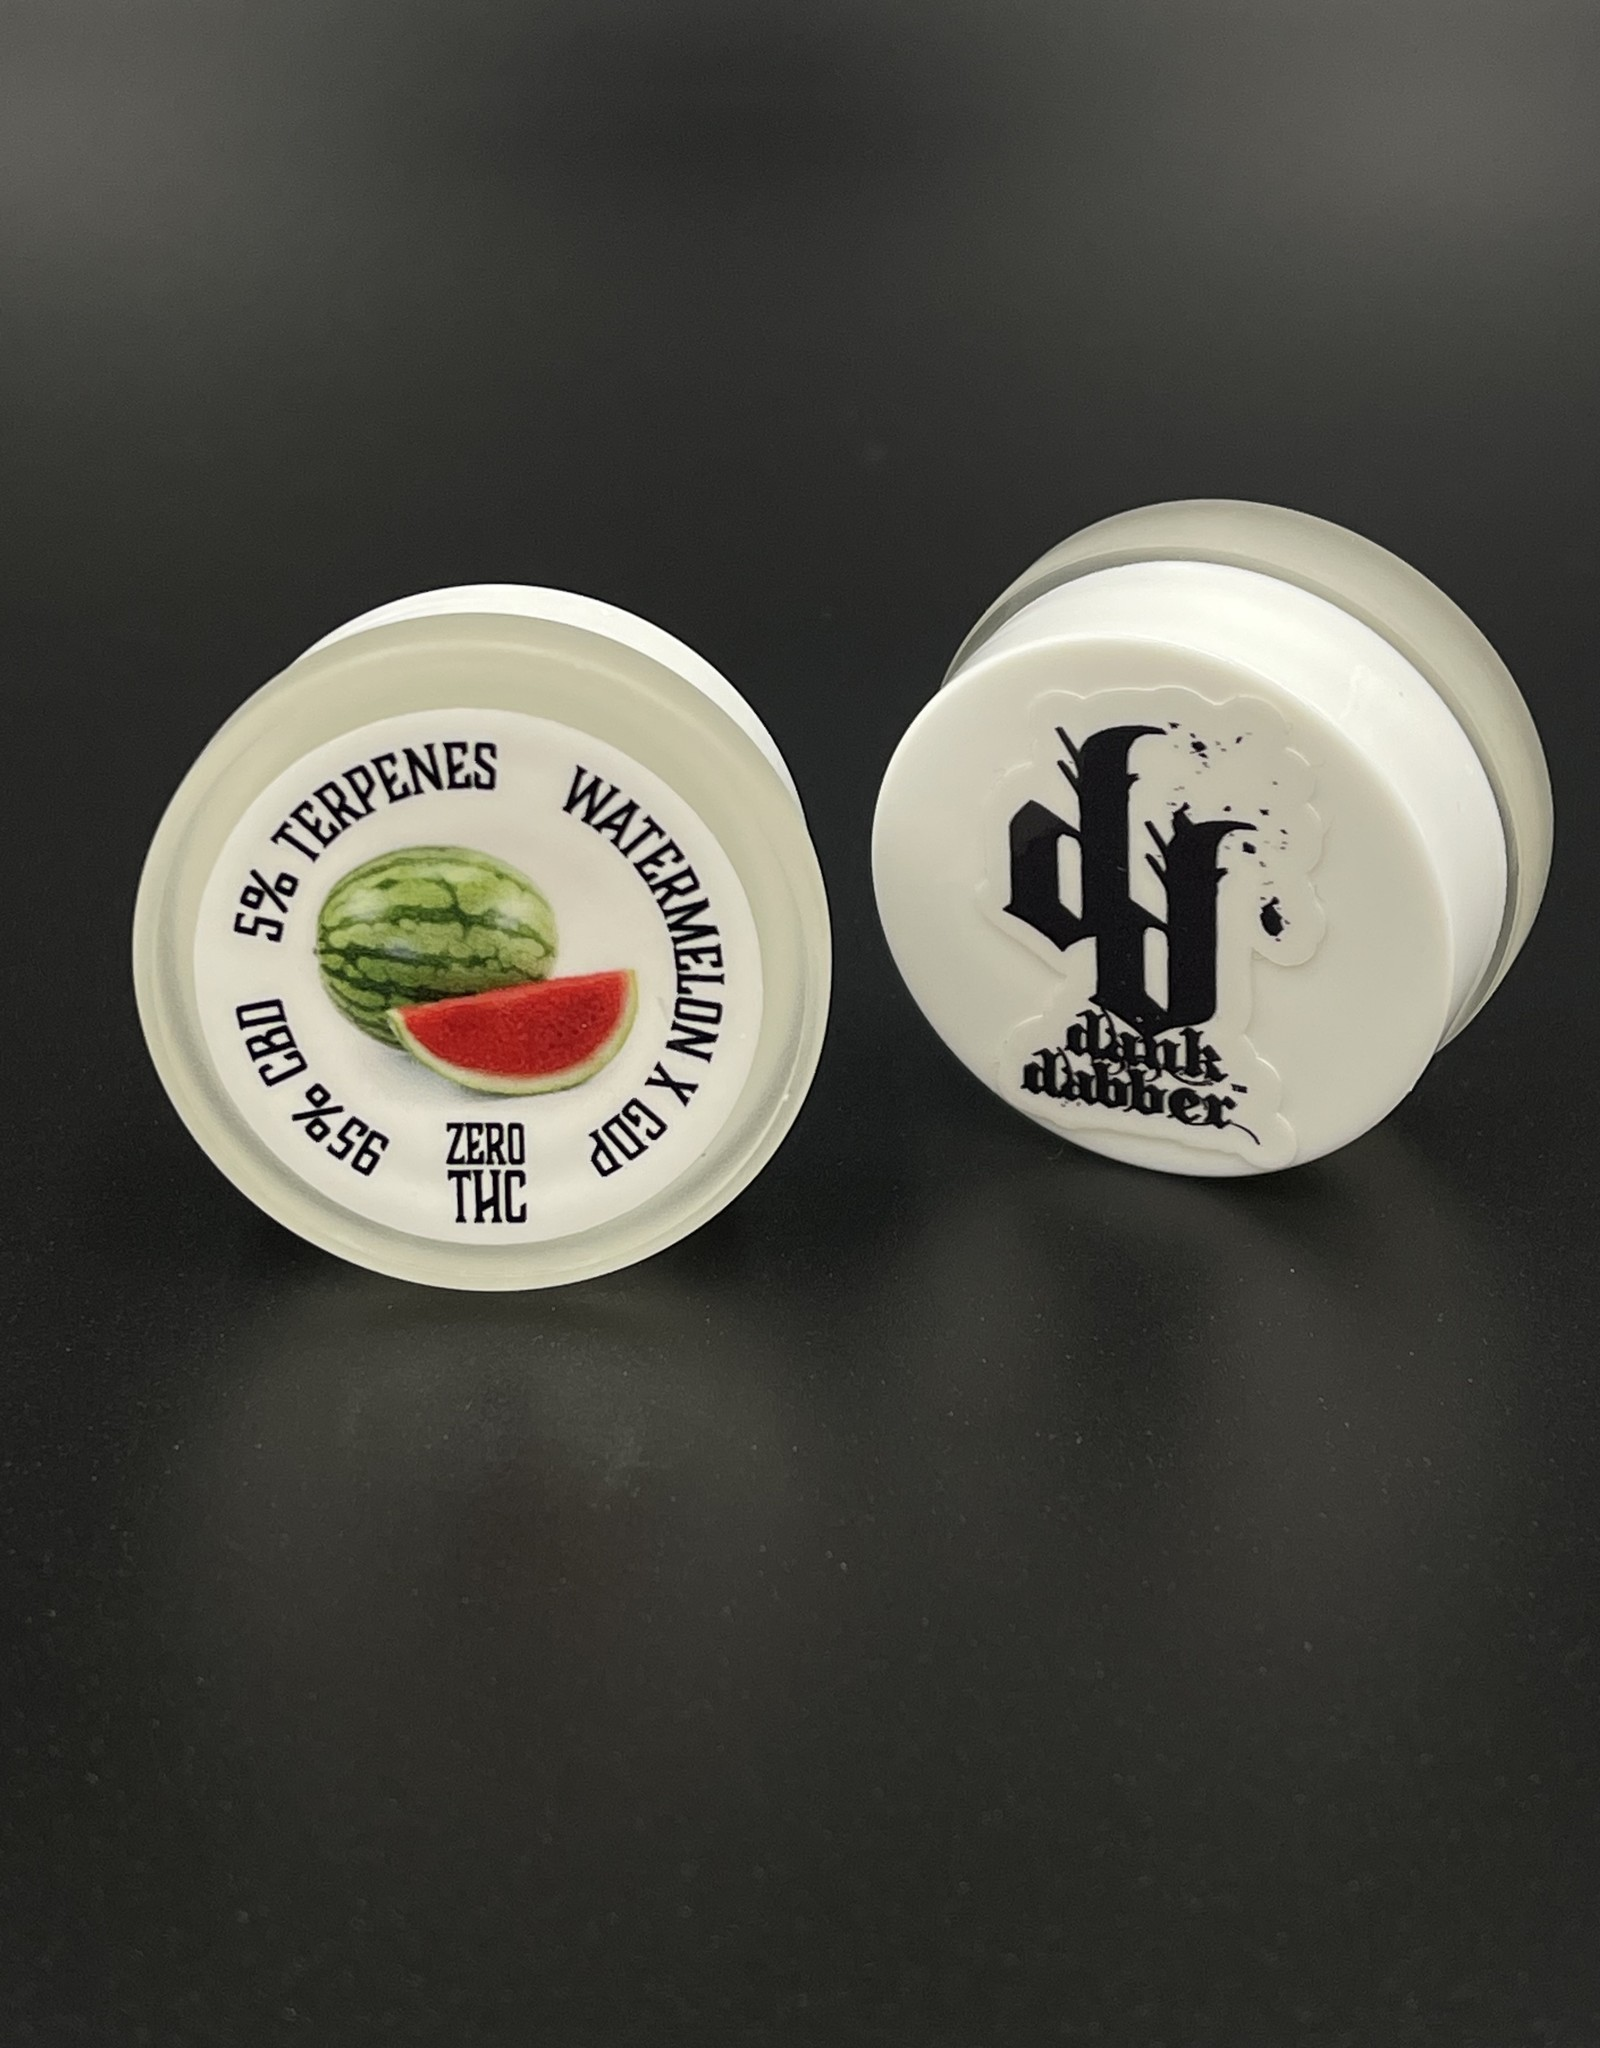 Watermelon X GDP CBD Isolate